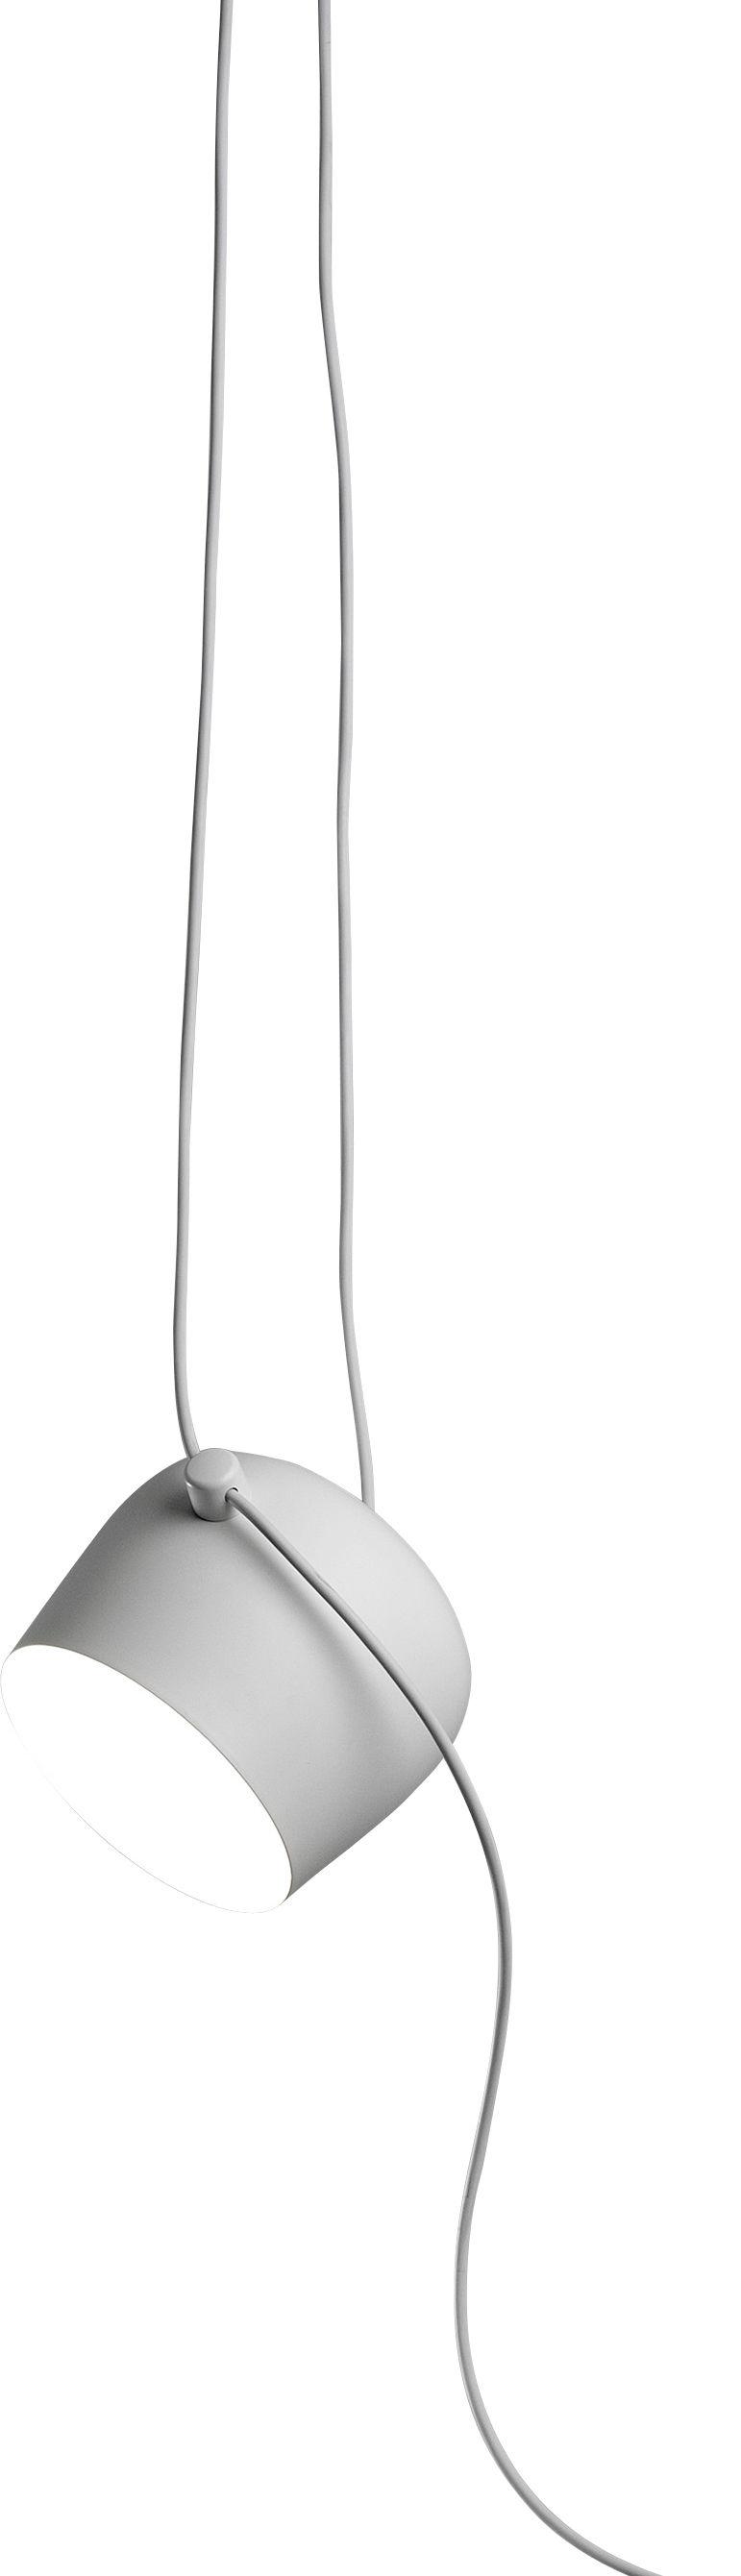 Lighting - Pendant Lighting - AIM LED Lamp - Ø 24 cm - Wall plug by Flos - White - Painted aluminium, Polycarbonate